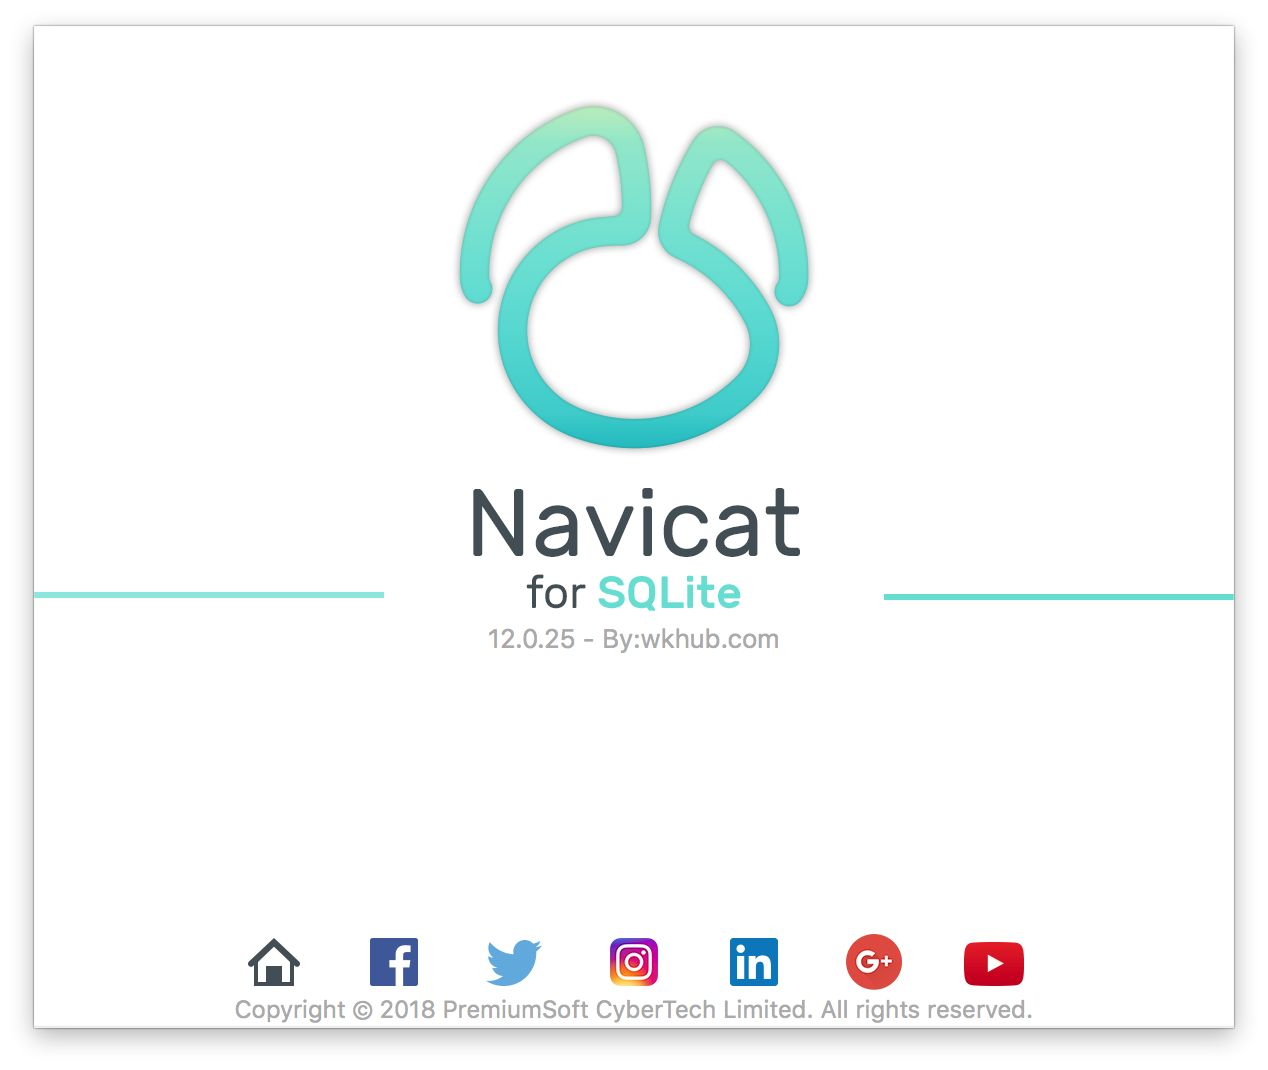 Navicat for SQLite 12.0.26 图形化 SQLite 数据库管理工具